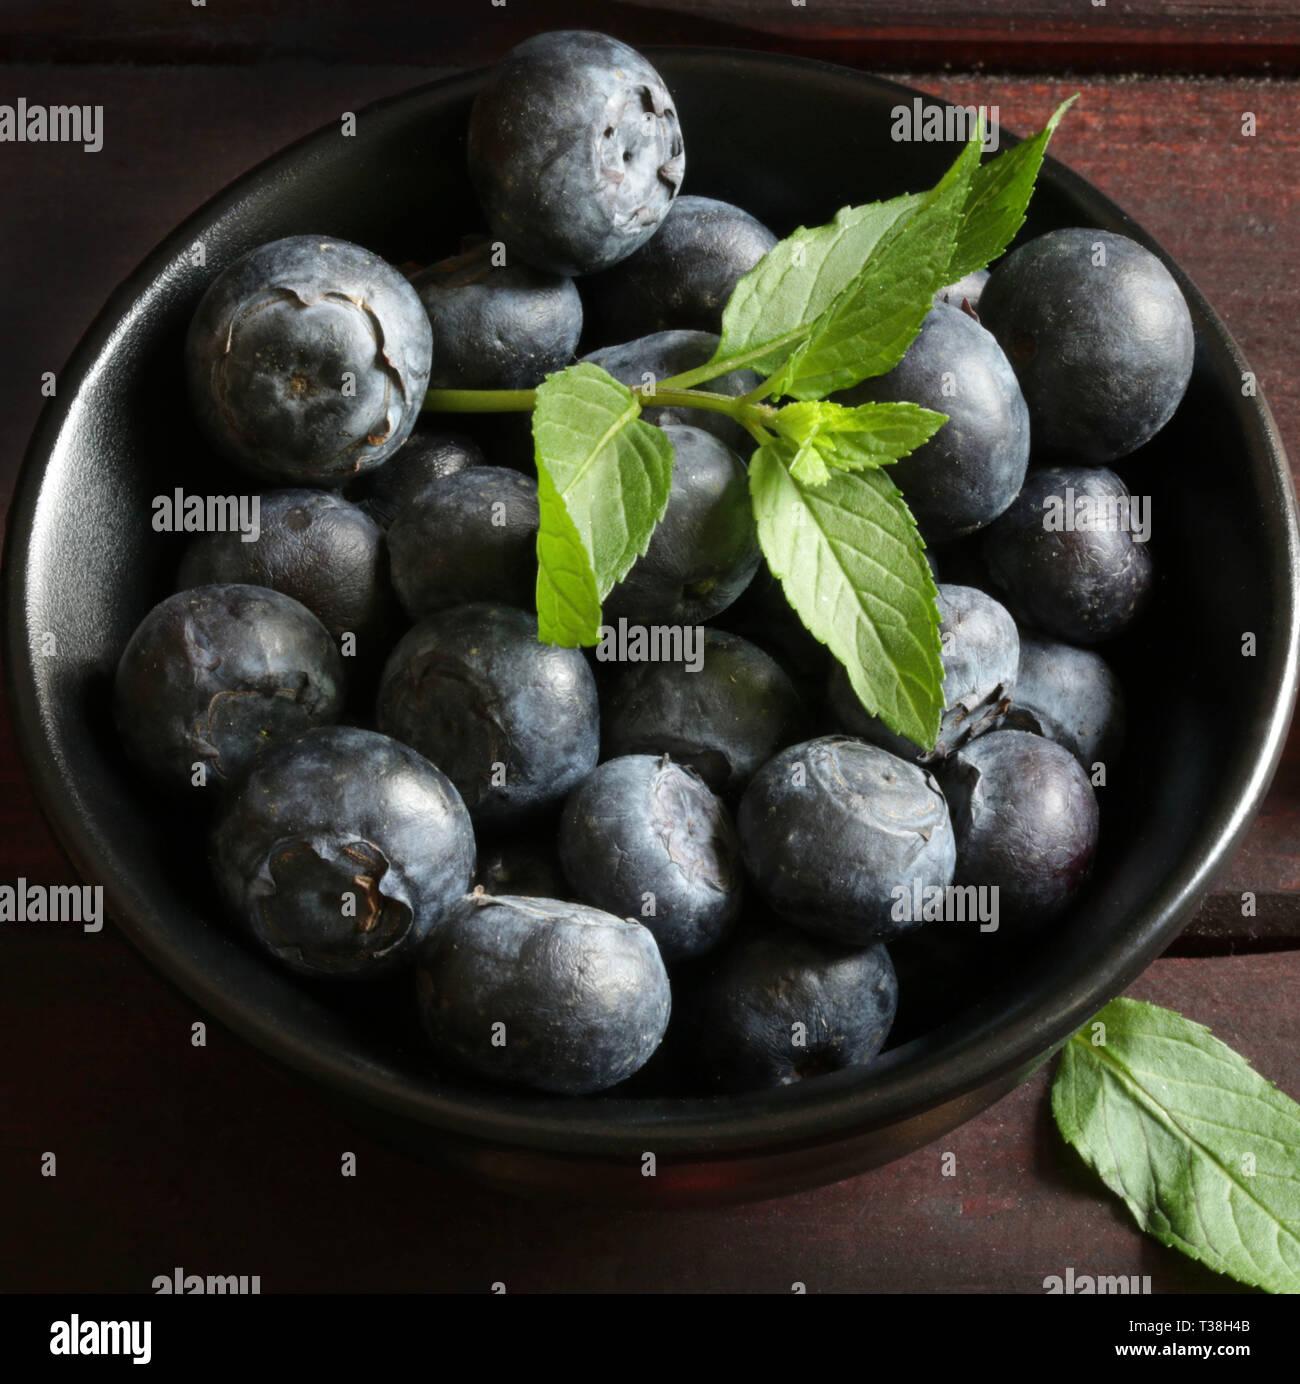 bowl of fresh blueberries - Stock Image